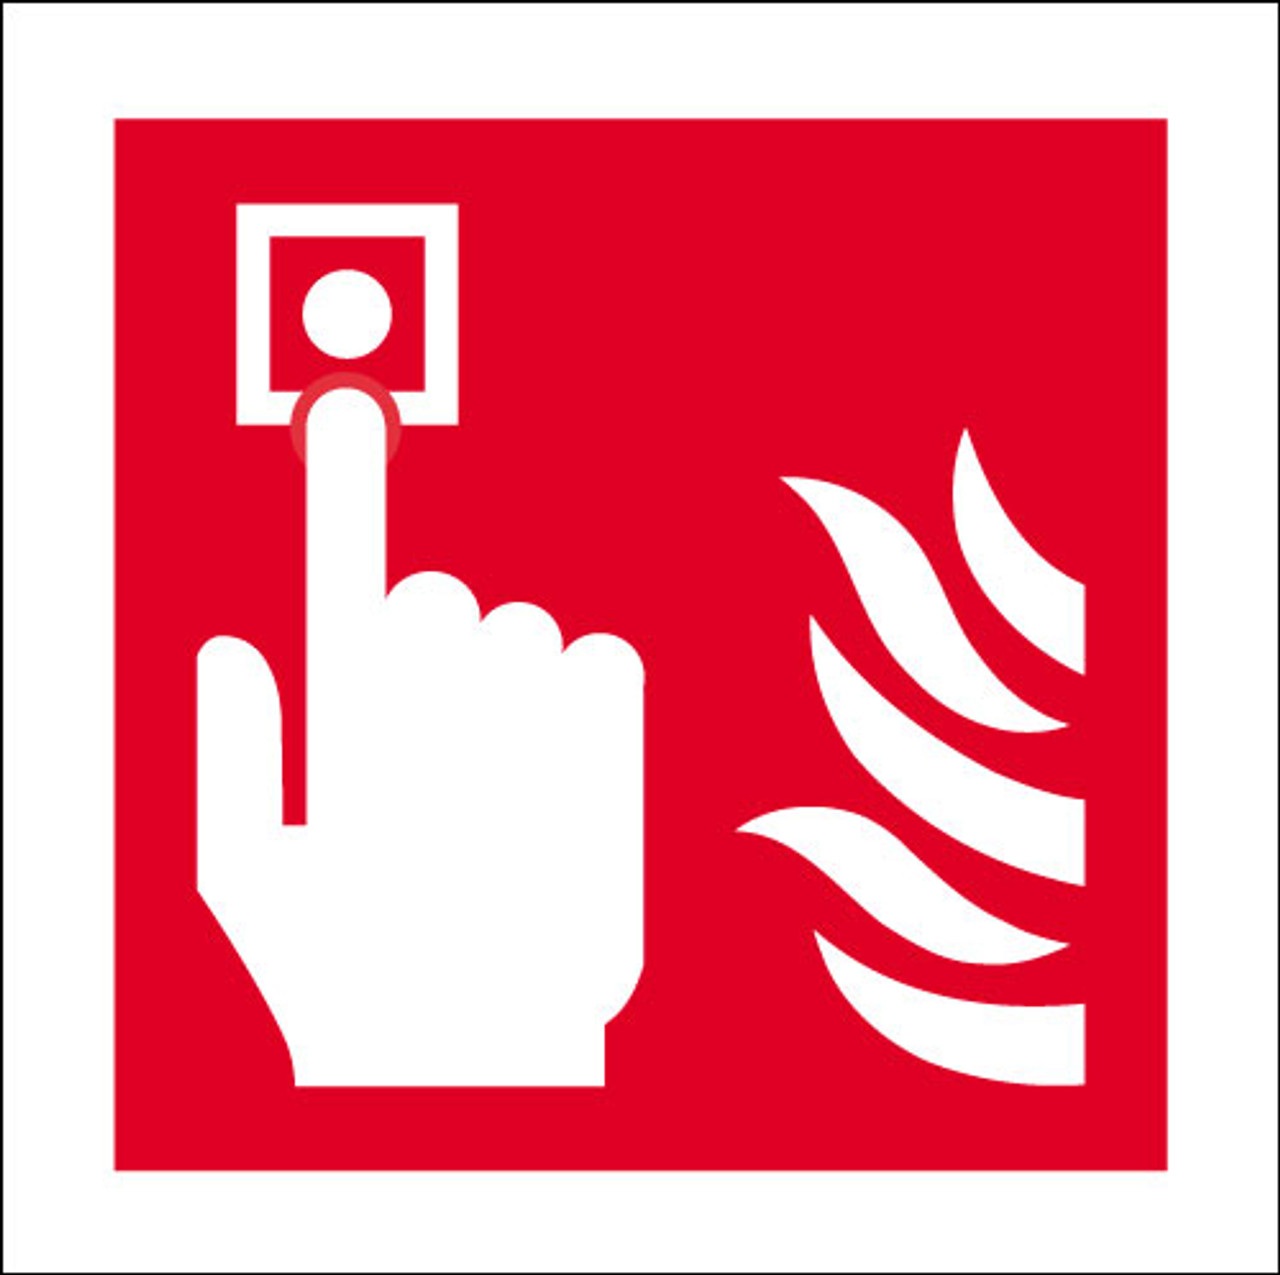 Fire alarm logo